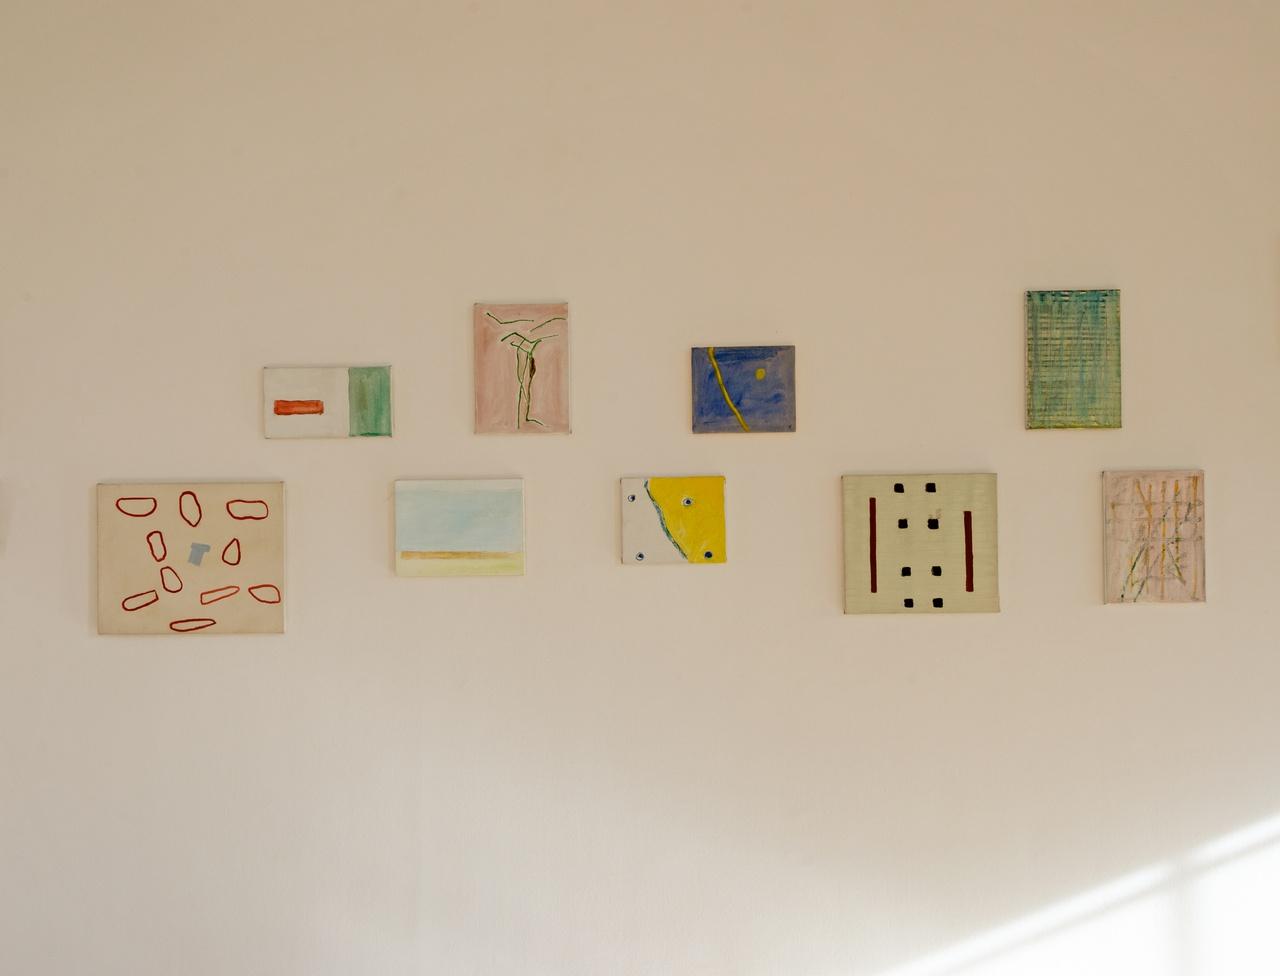 2/6 - Raoul de Keyser, tentoonstelling Paintings 1967-2012 bij Inverleith House, Edinburgh, 2015.